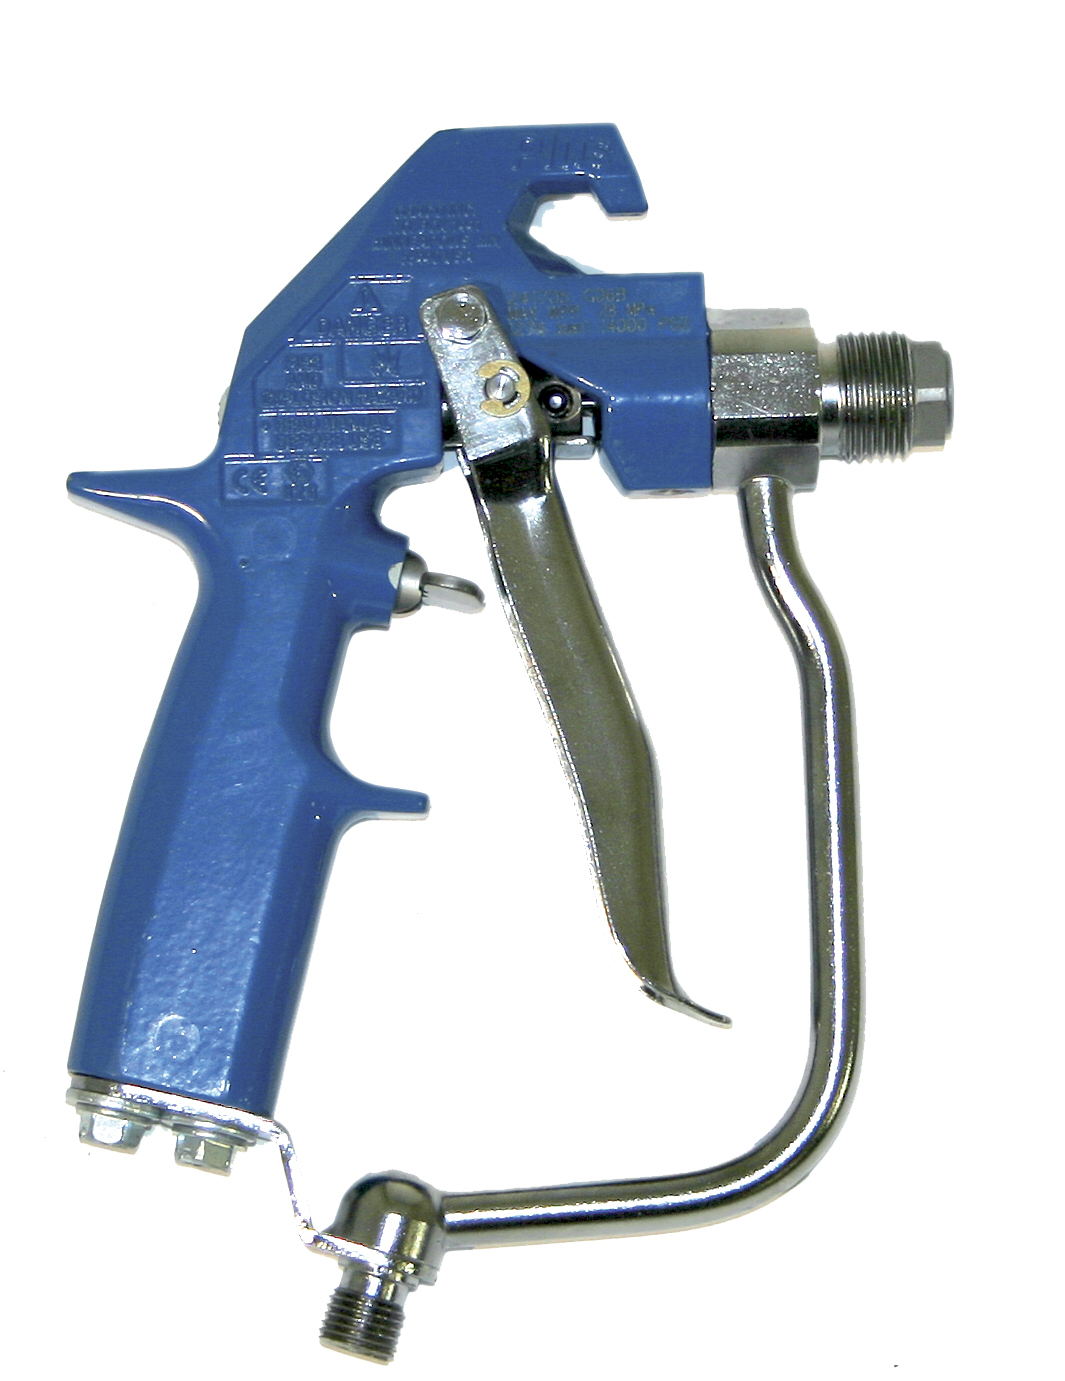 pistolet airless 1050 1060 texpray sans support de buse et sans buse. Black Bedroom Furniture Sets. Home Design Ideas